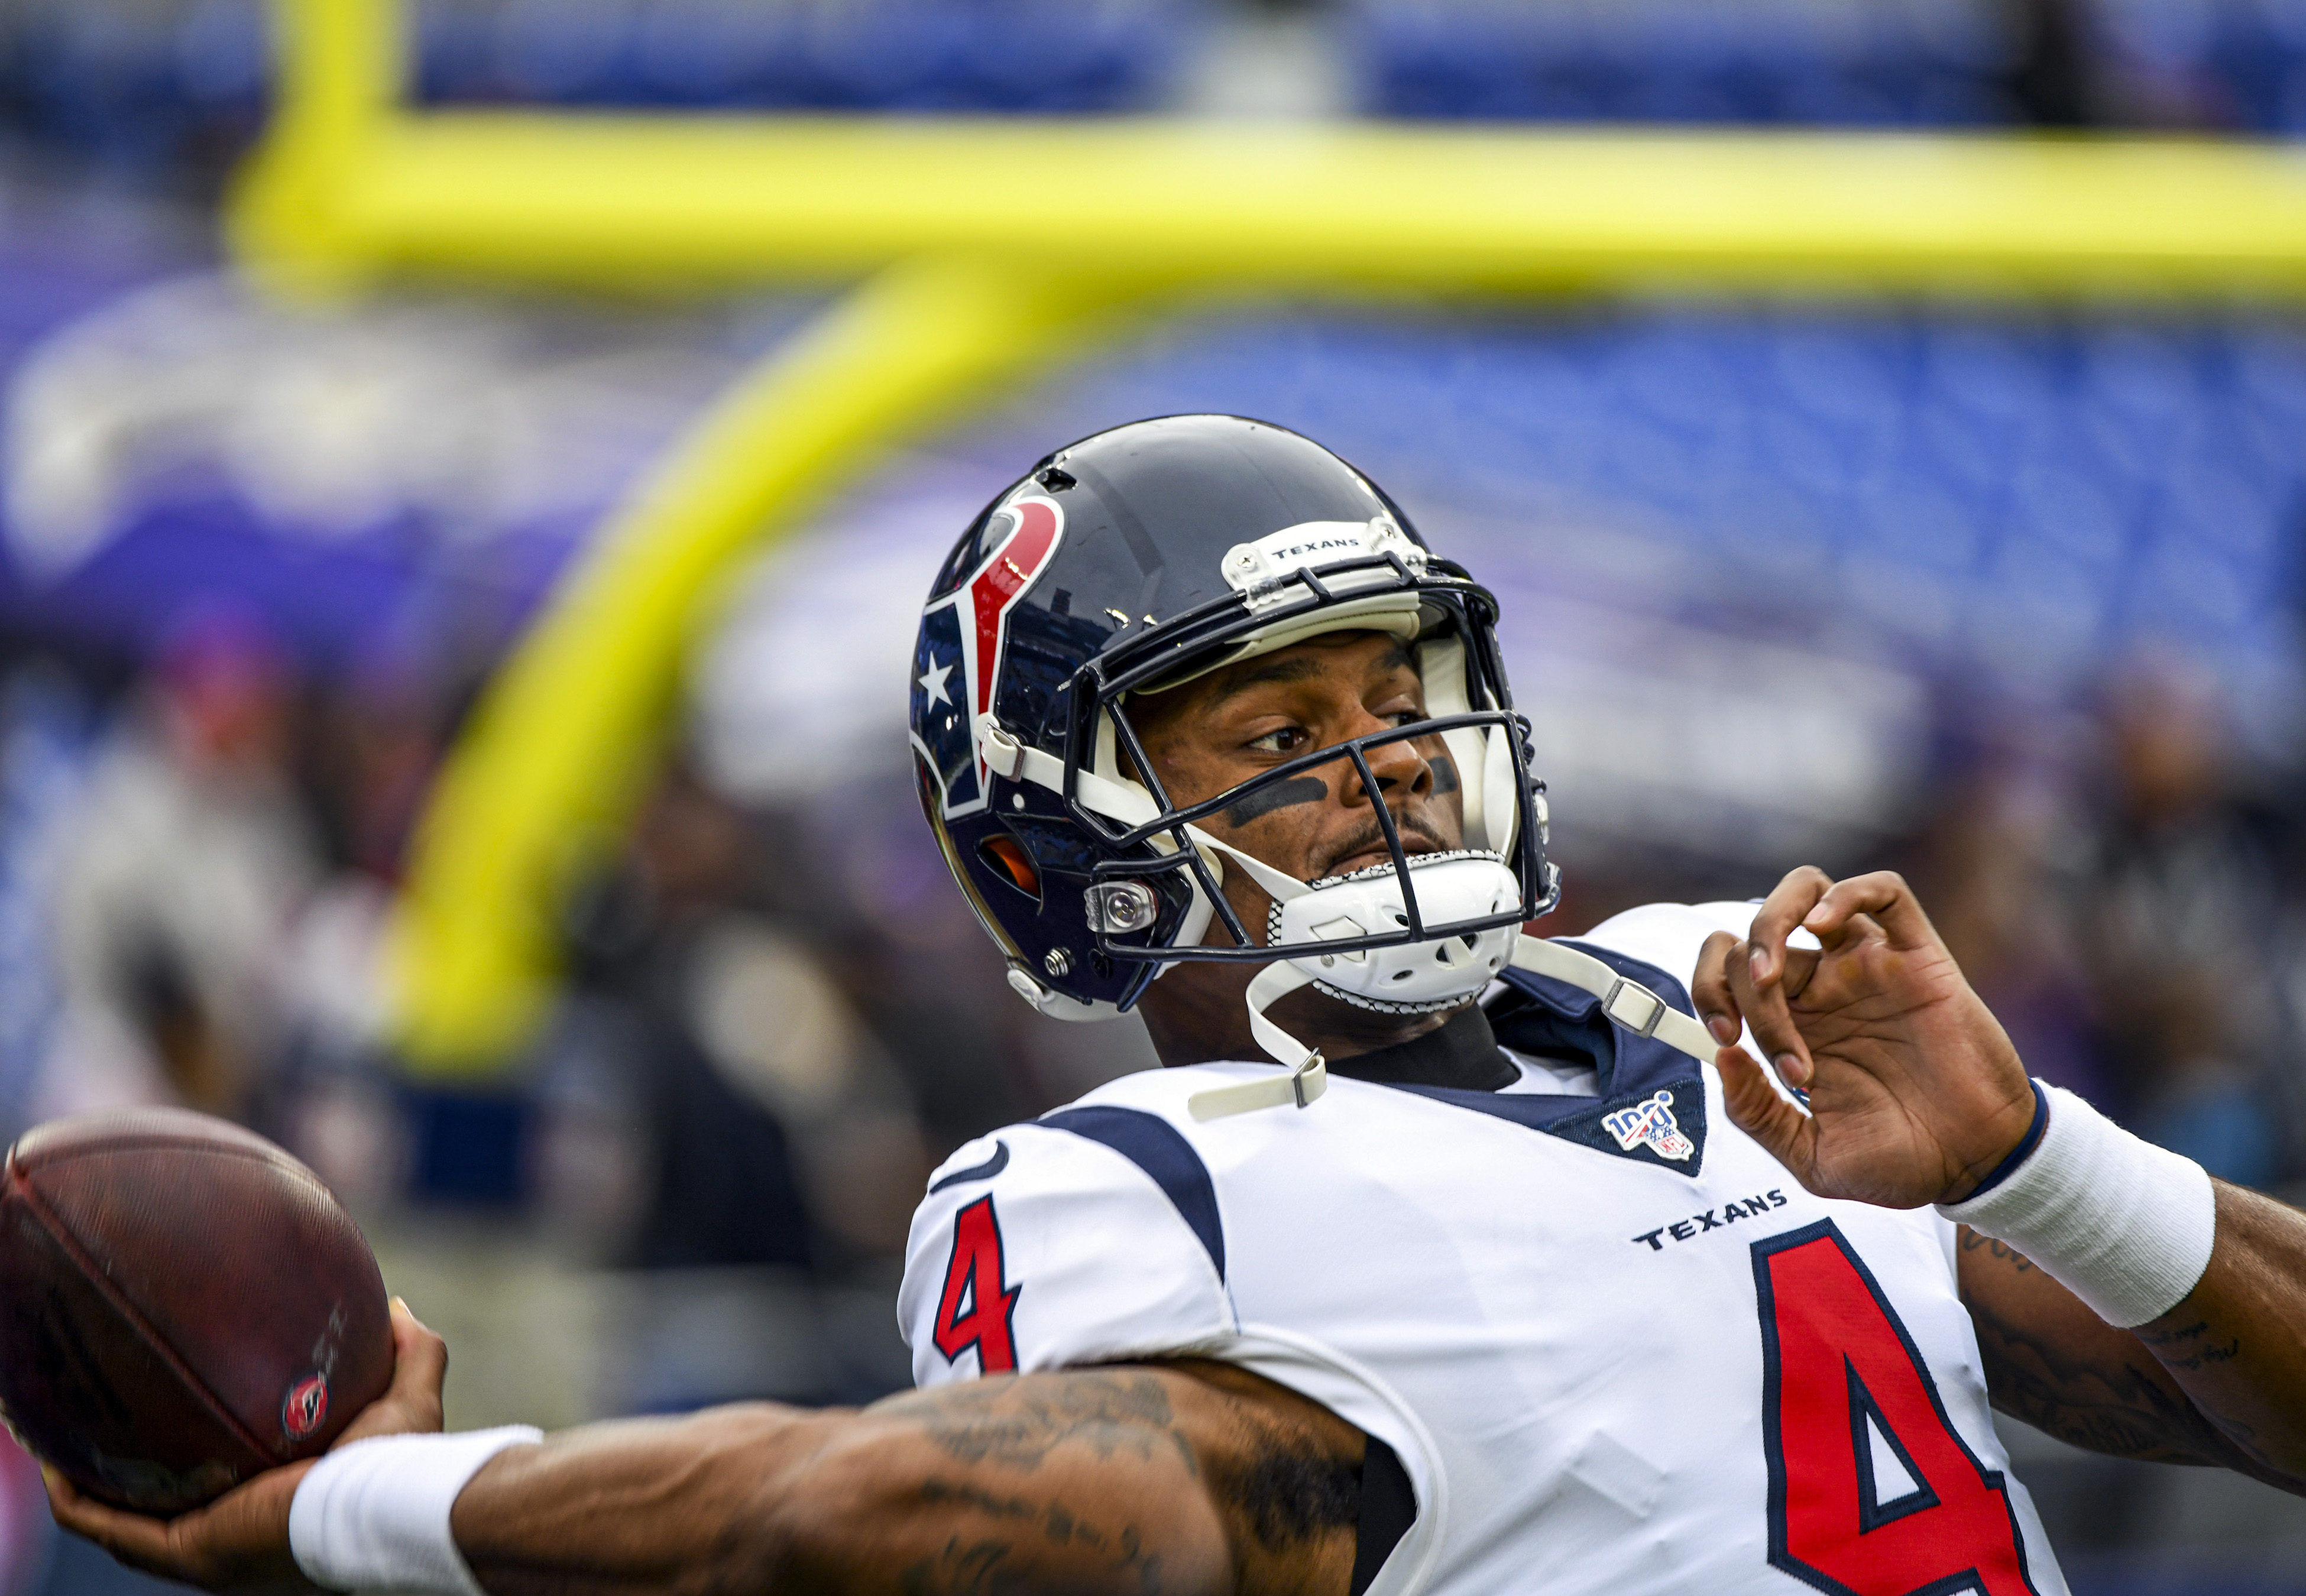 NFL: NOV 17 Texans at Ravens